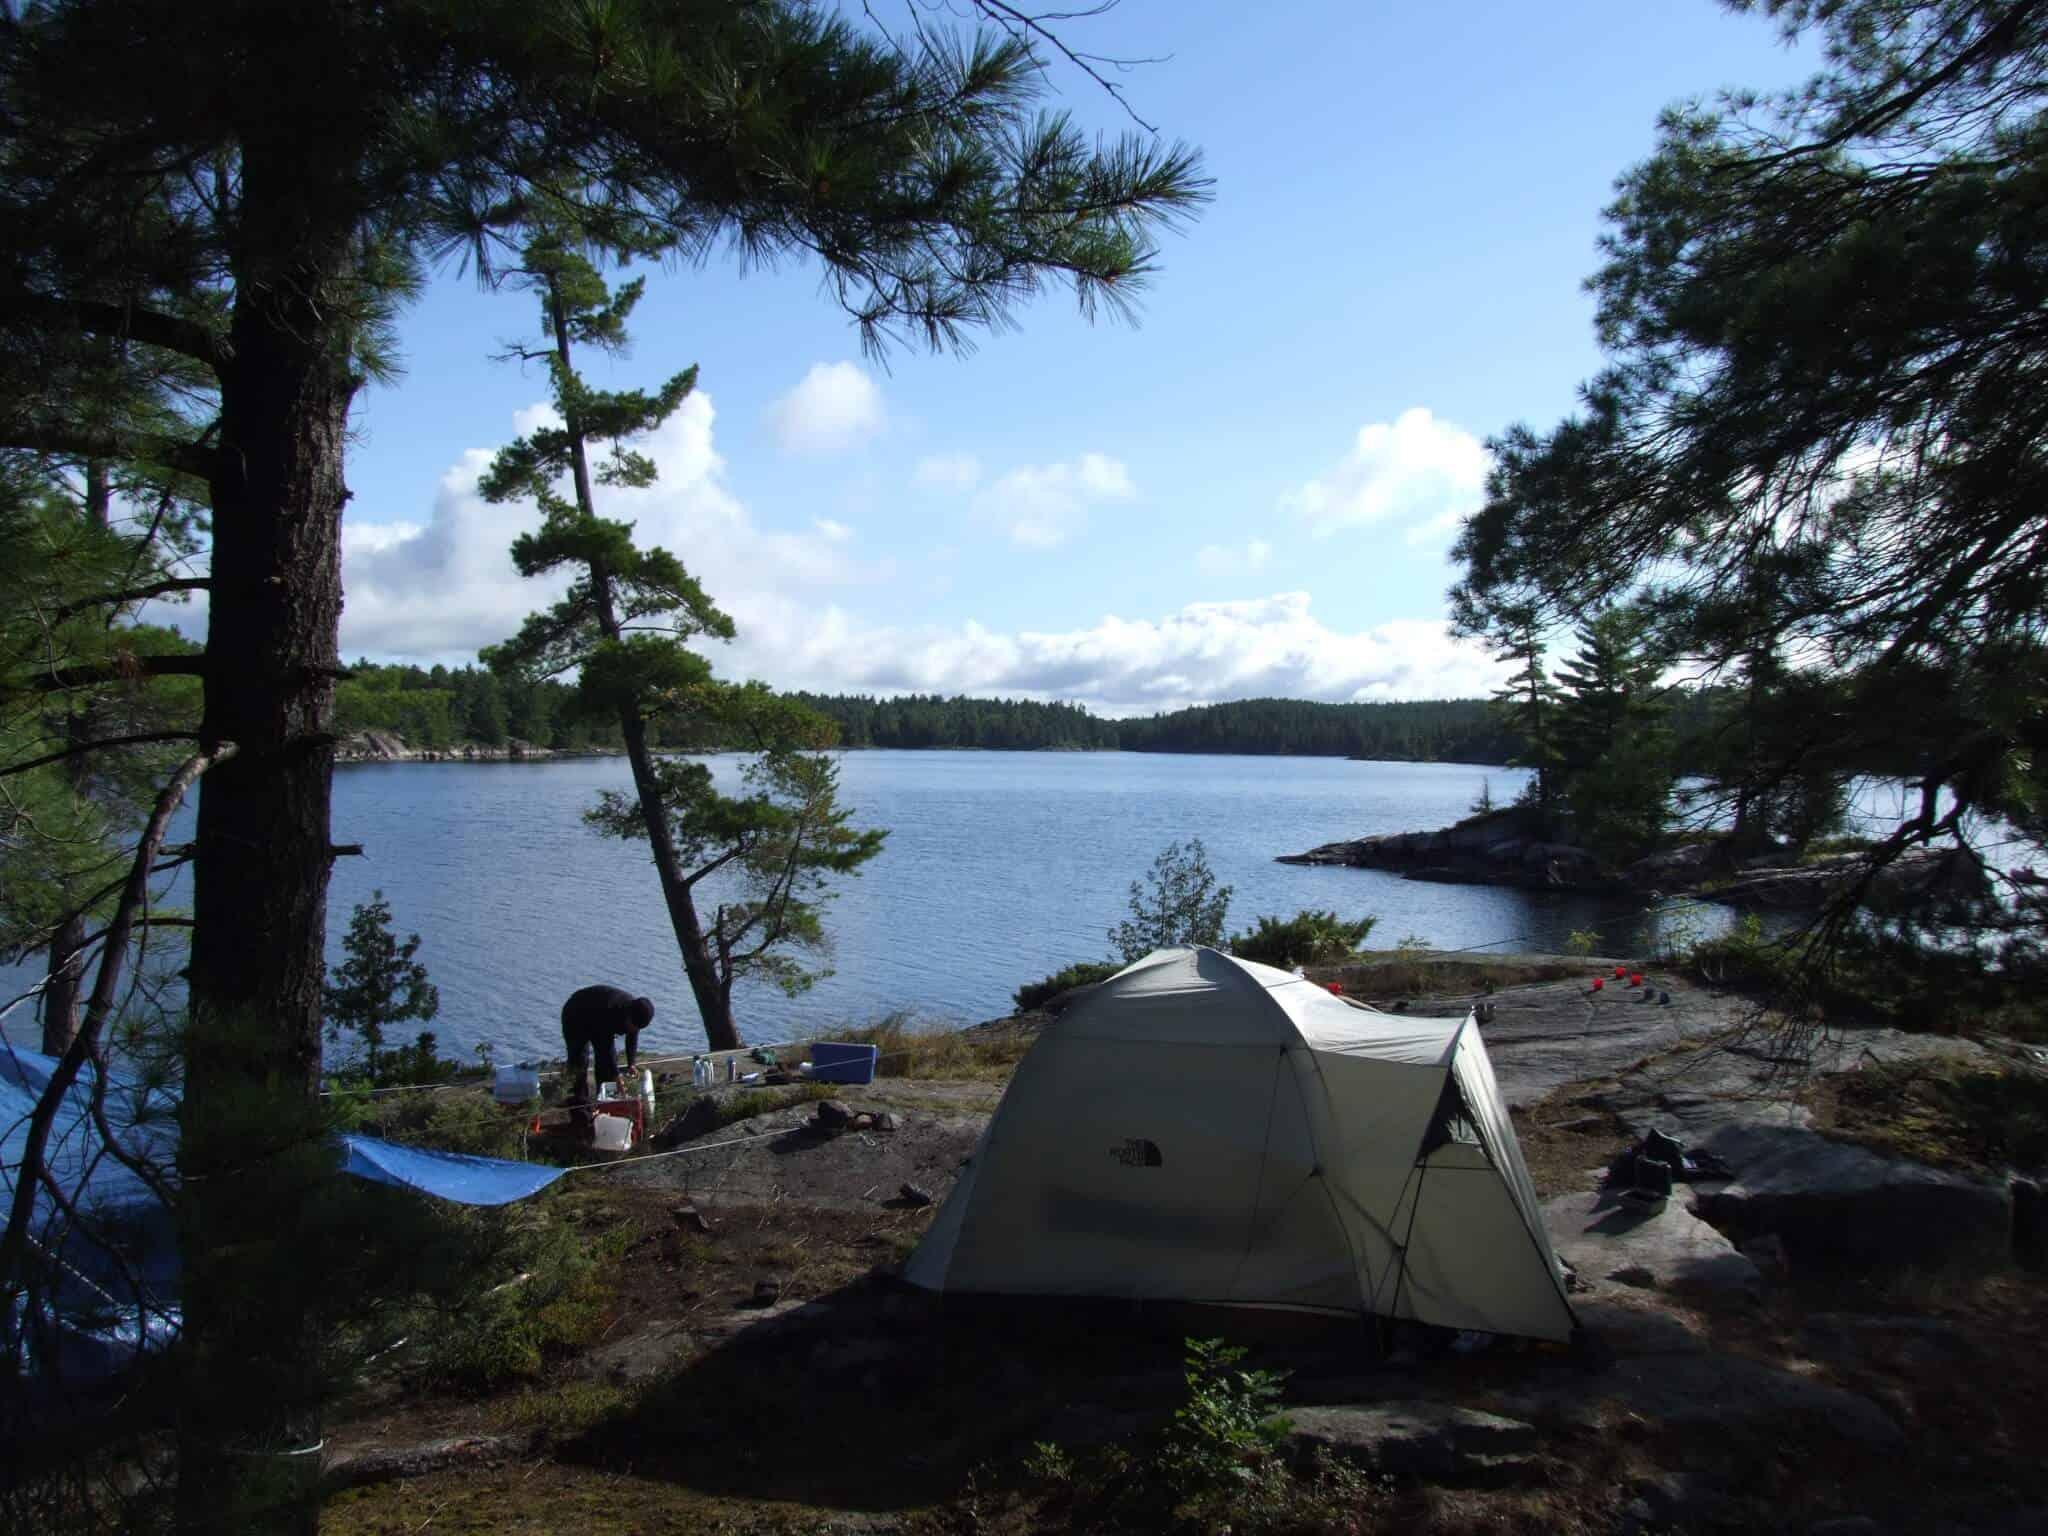 trip overview and navigation through algonquin park